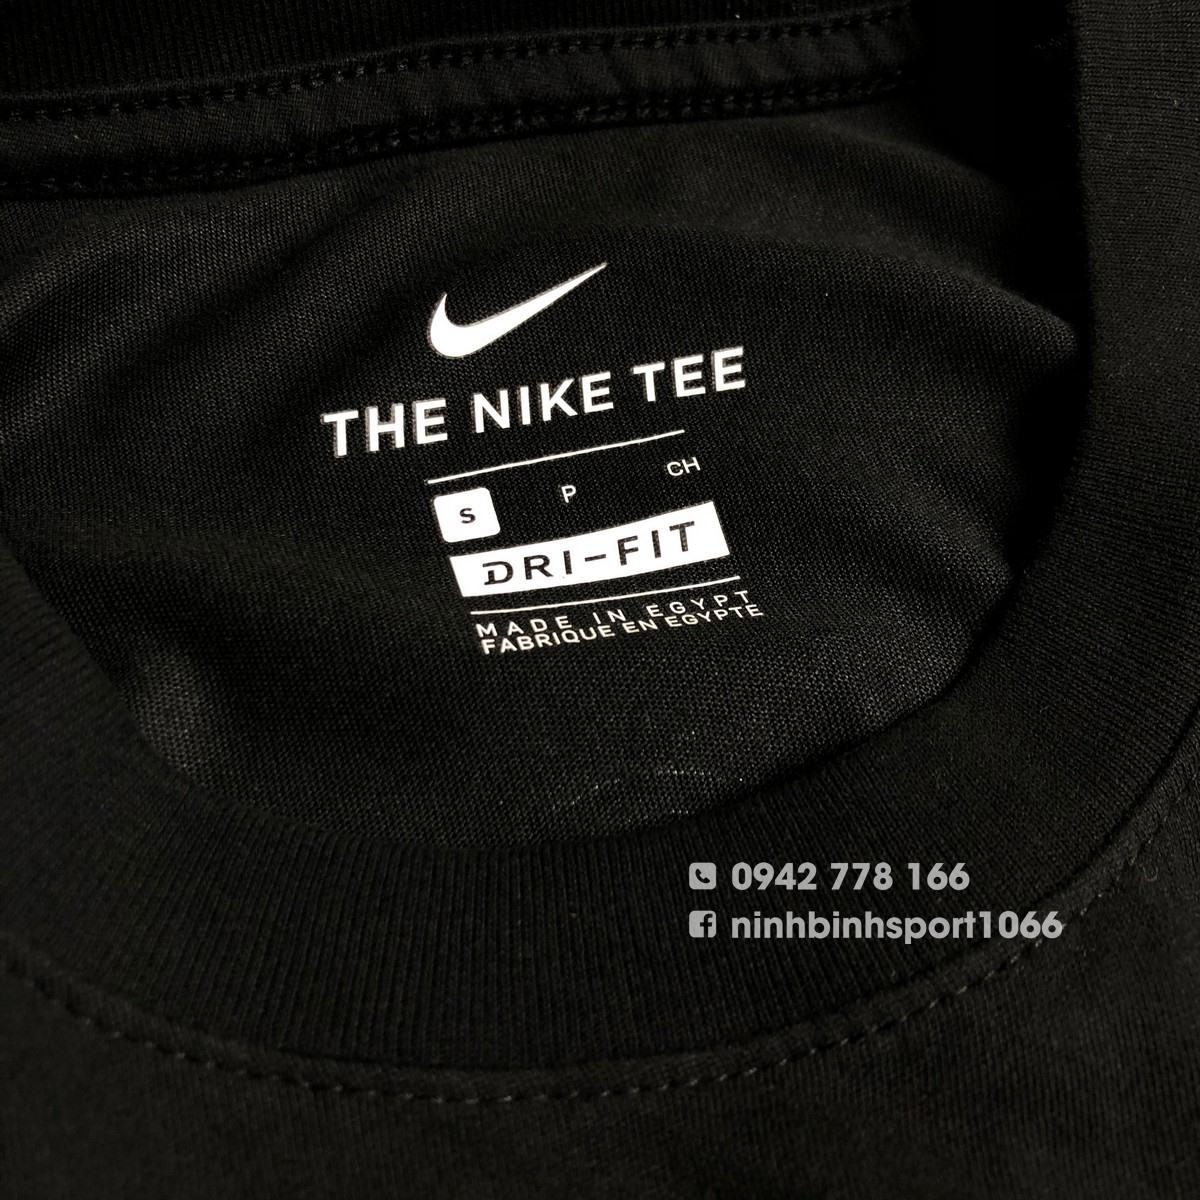 Áo thể thao nam Nike Dry Fit CT6475